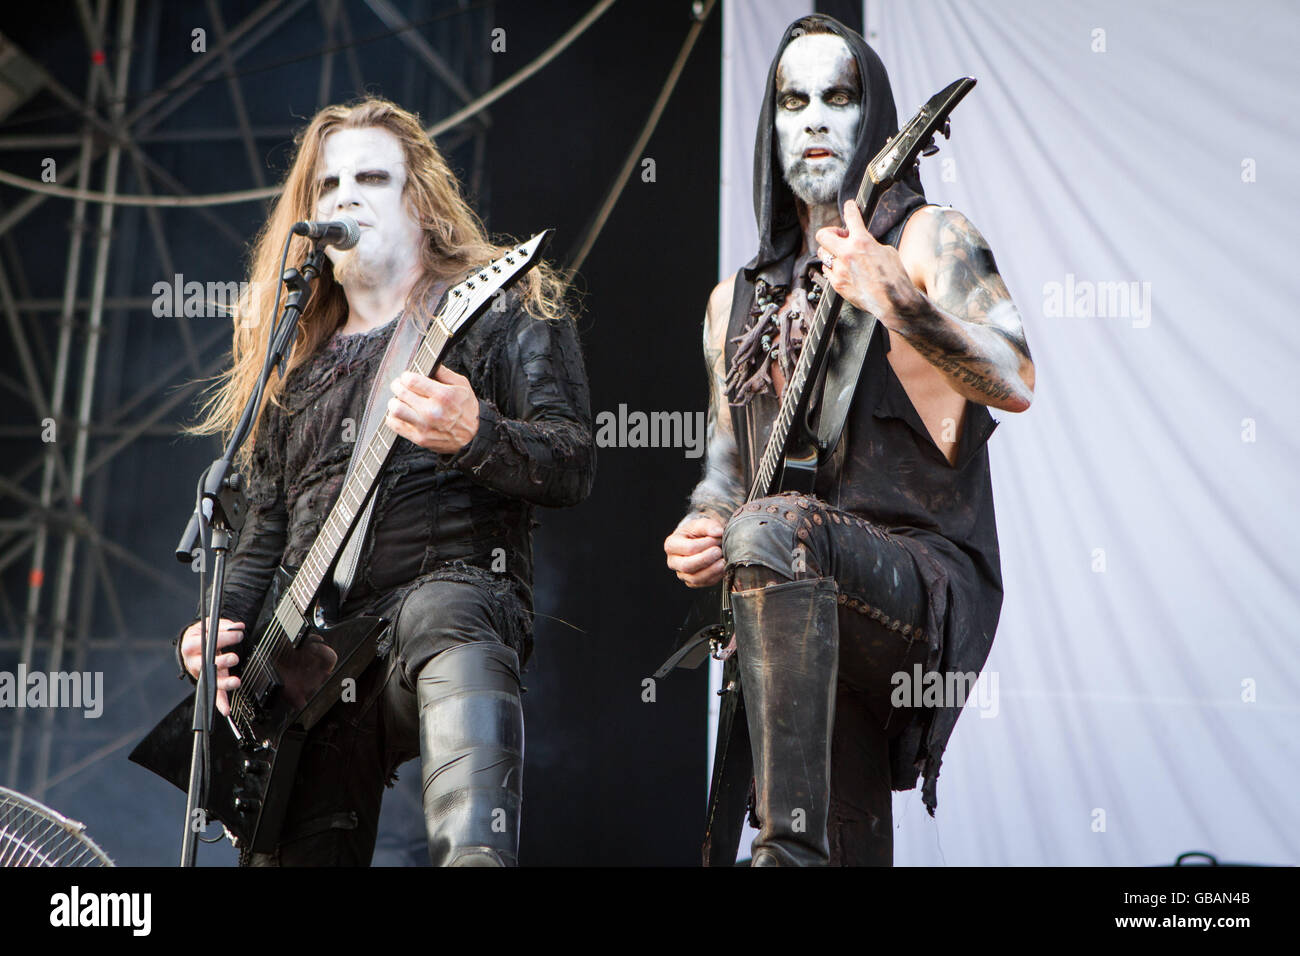 Milano,Italy 4th of July 2016 Behemoth performs live at Market Sound, Milano. © Davide Merli / Alamy Live News - Stock Image